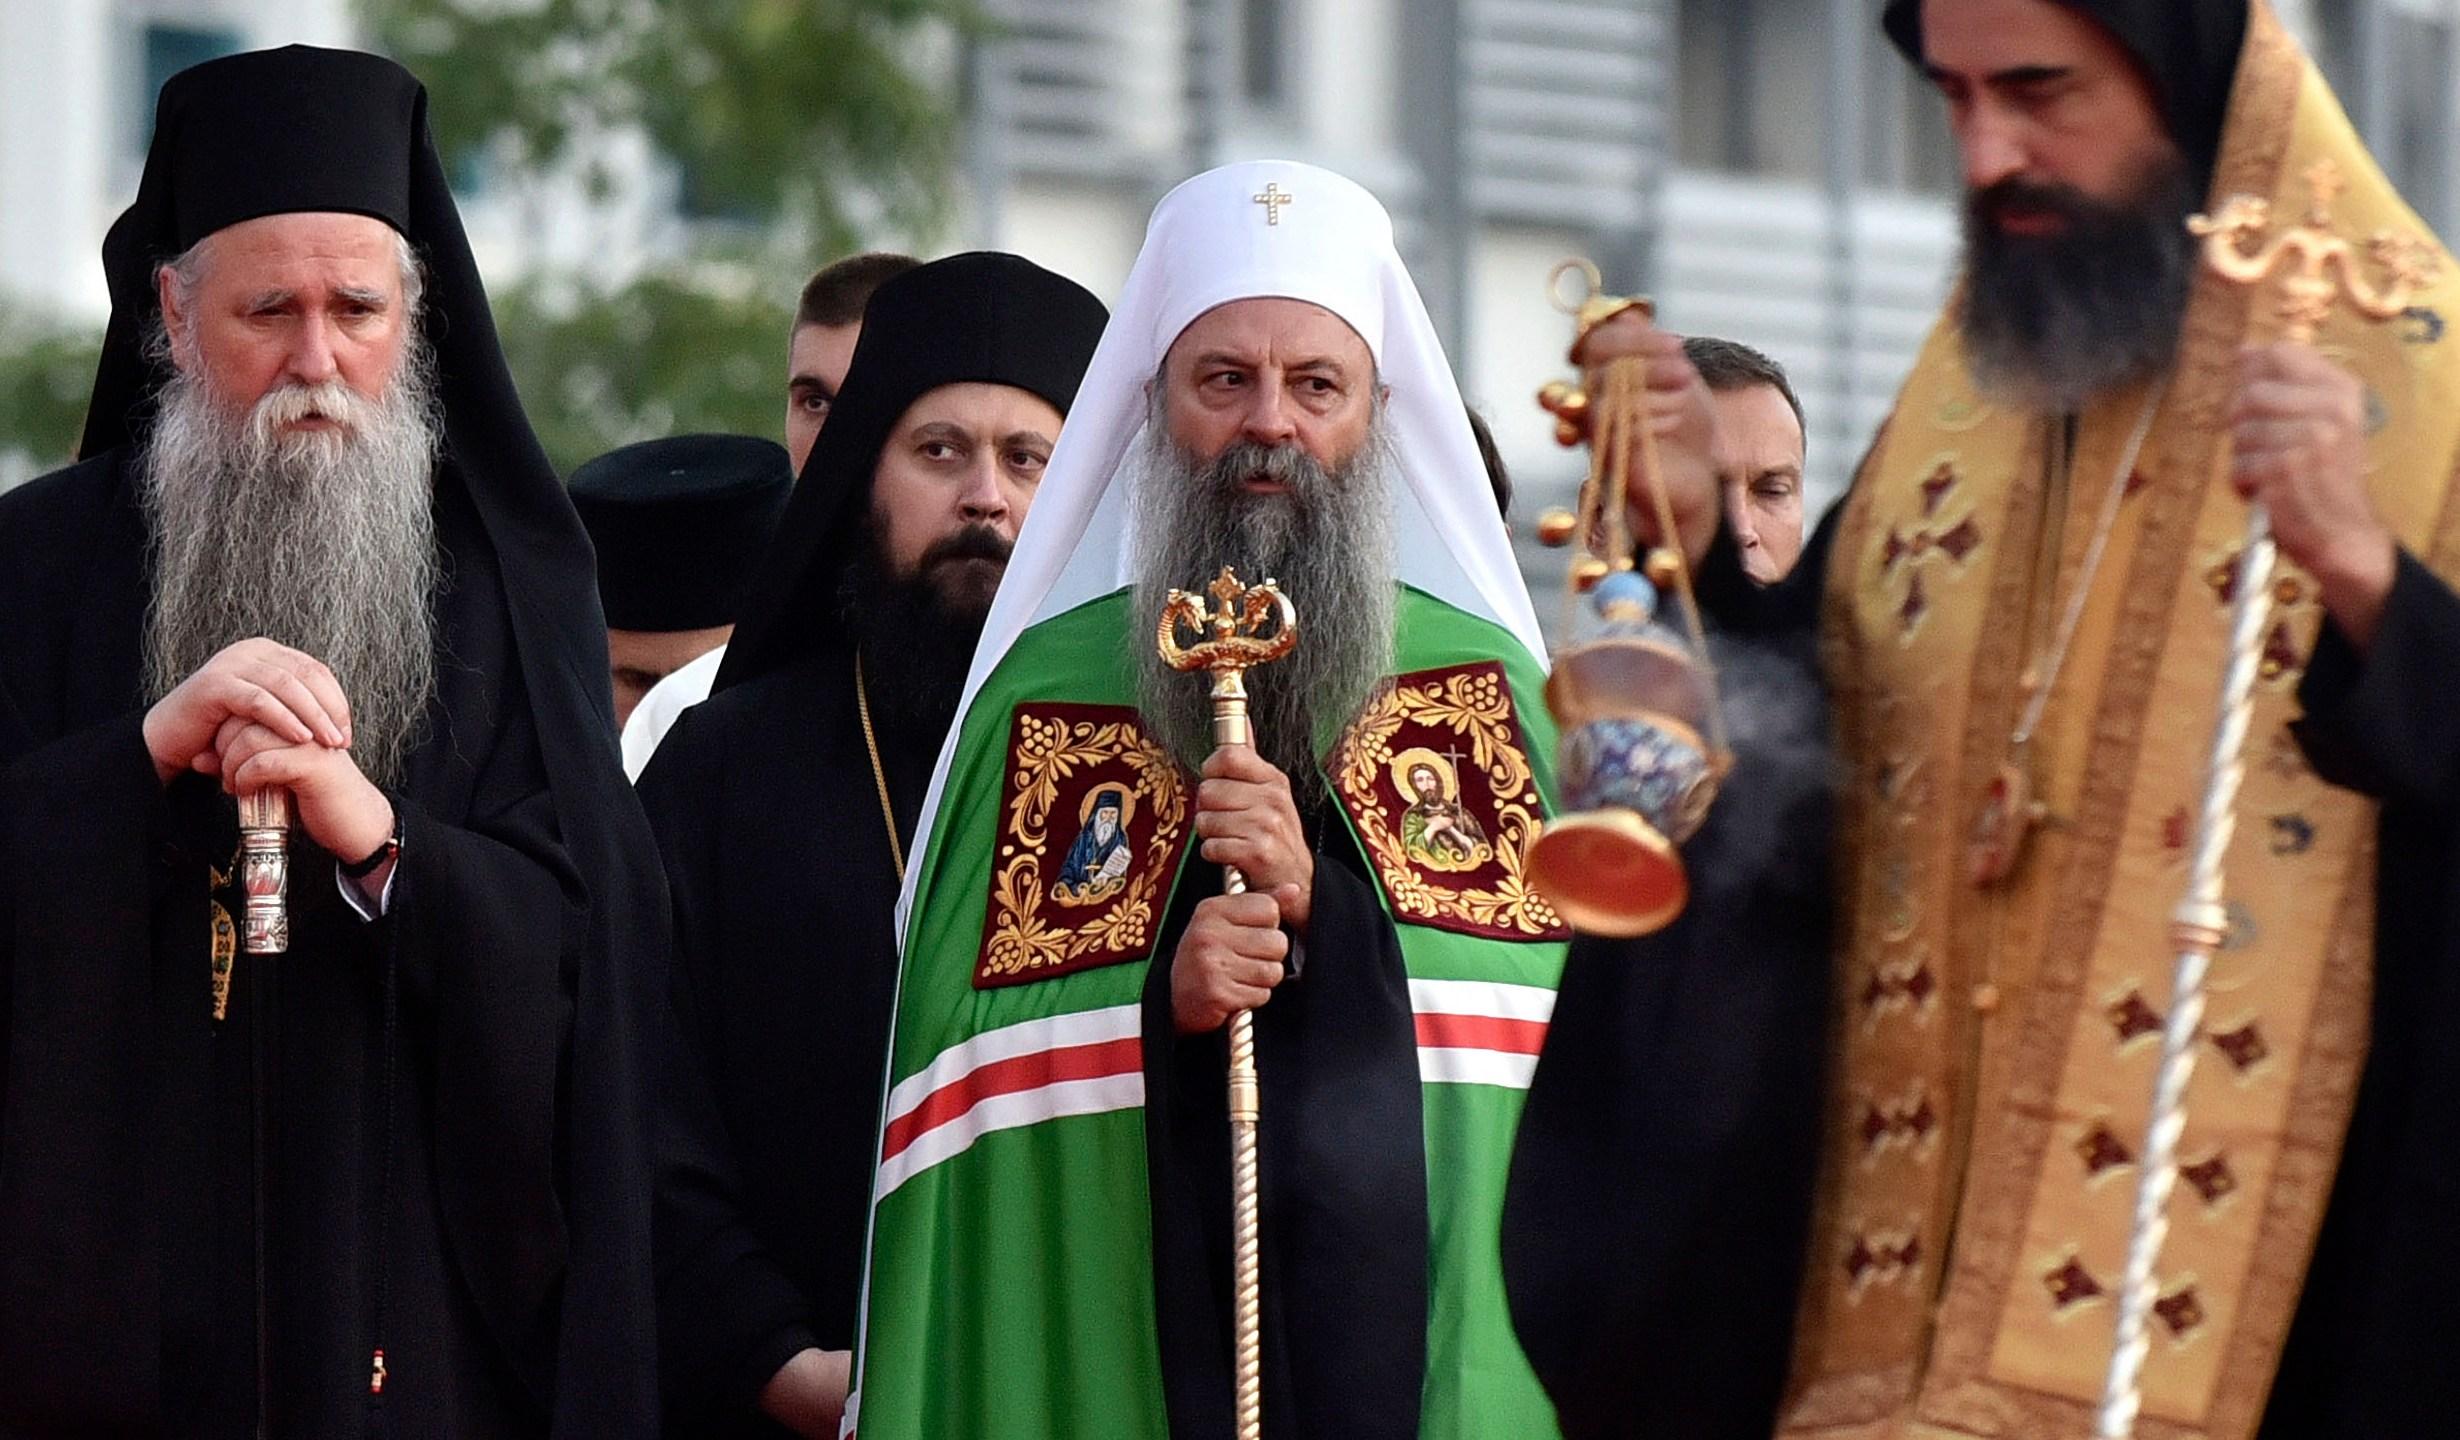 Patriarch Porfirije, Mitropolitan Joanikije